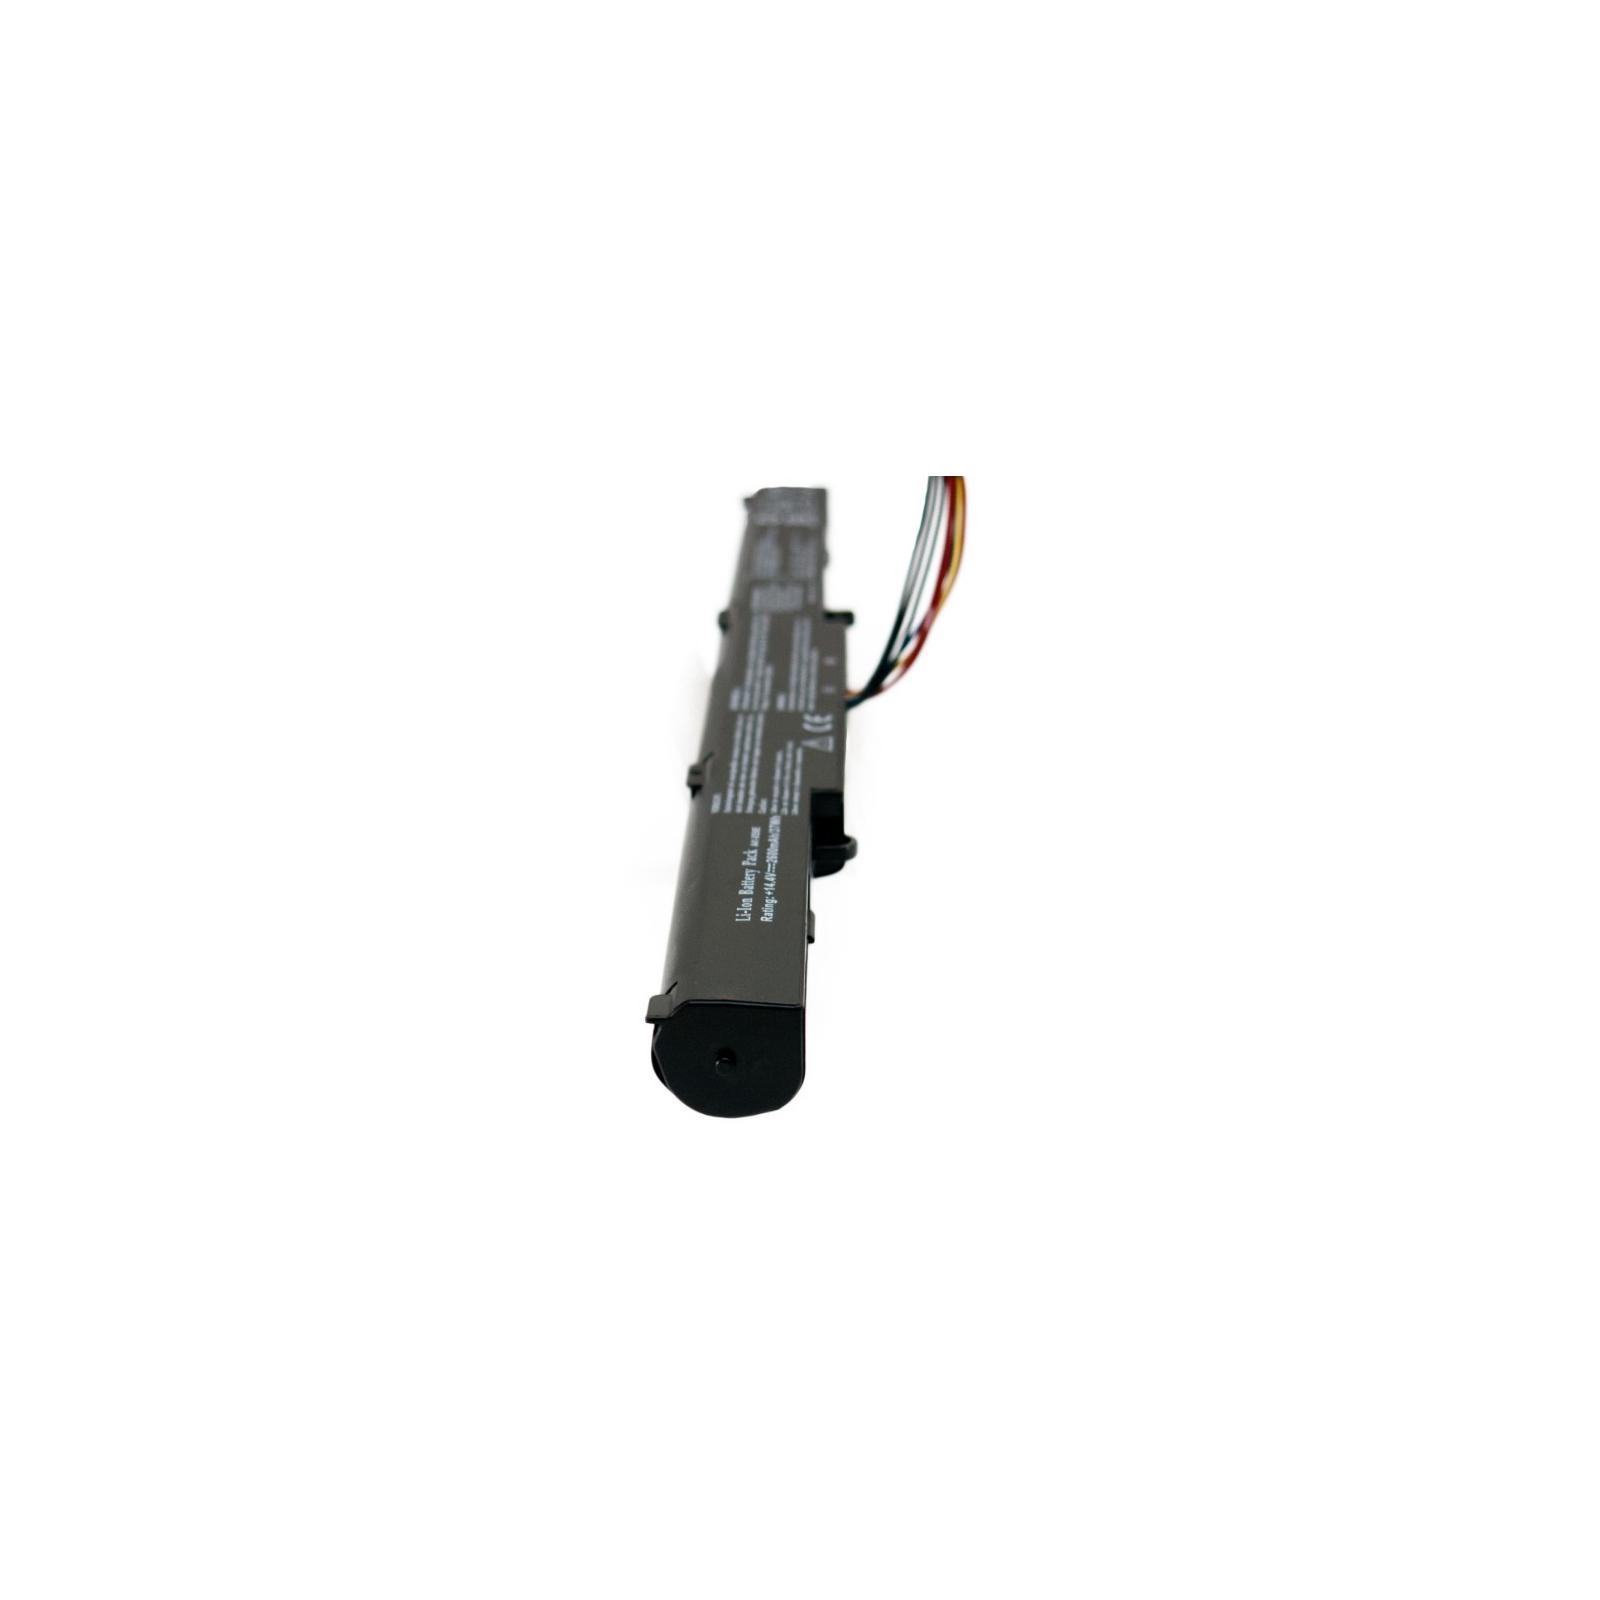 Аккумулятор для ноутбука Asus A41-X550E 14.8V, 2600mAh Extradigital (BNA3999) изображение 4